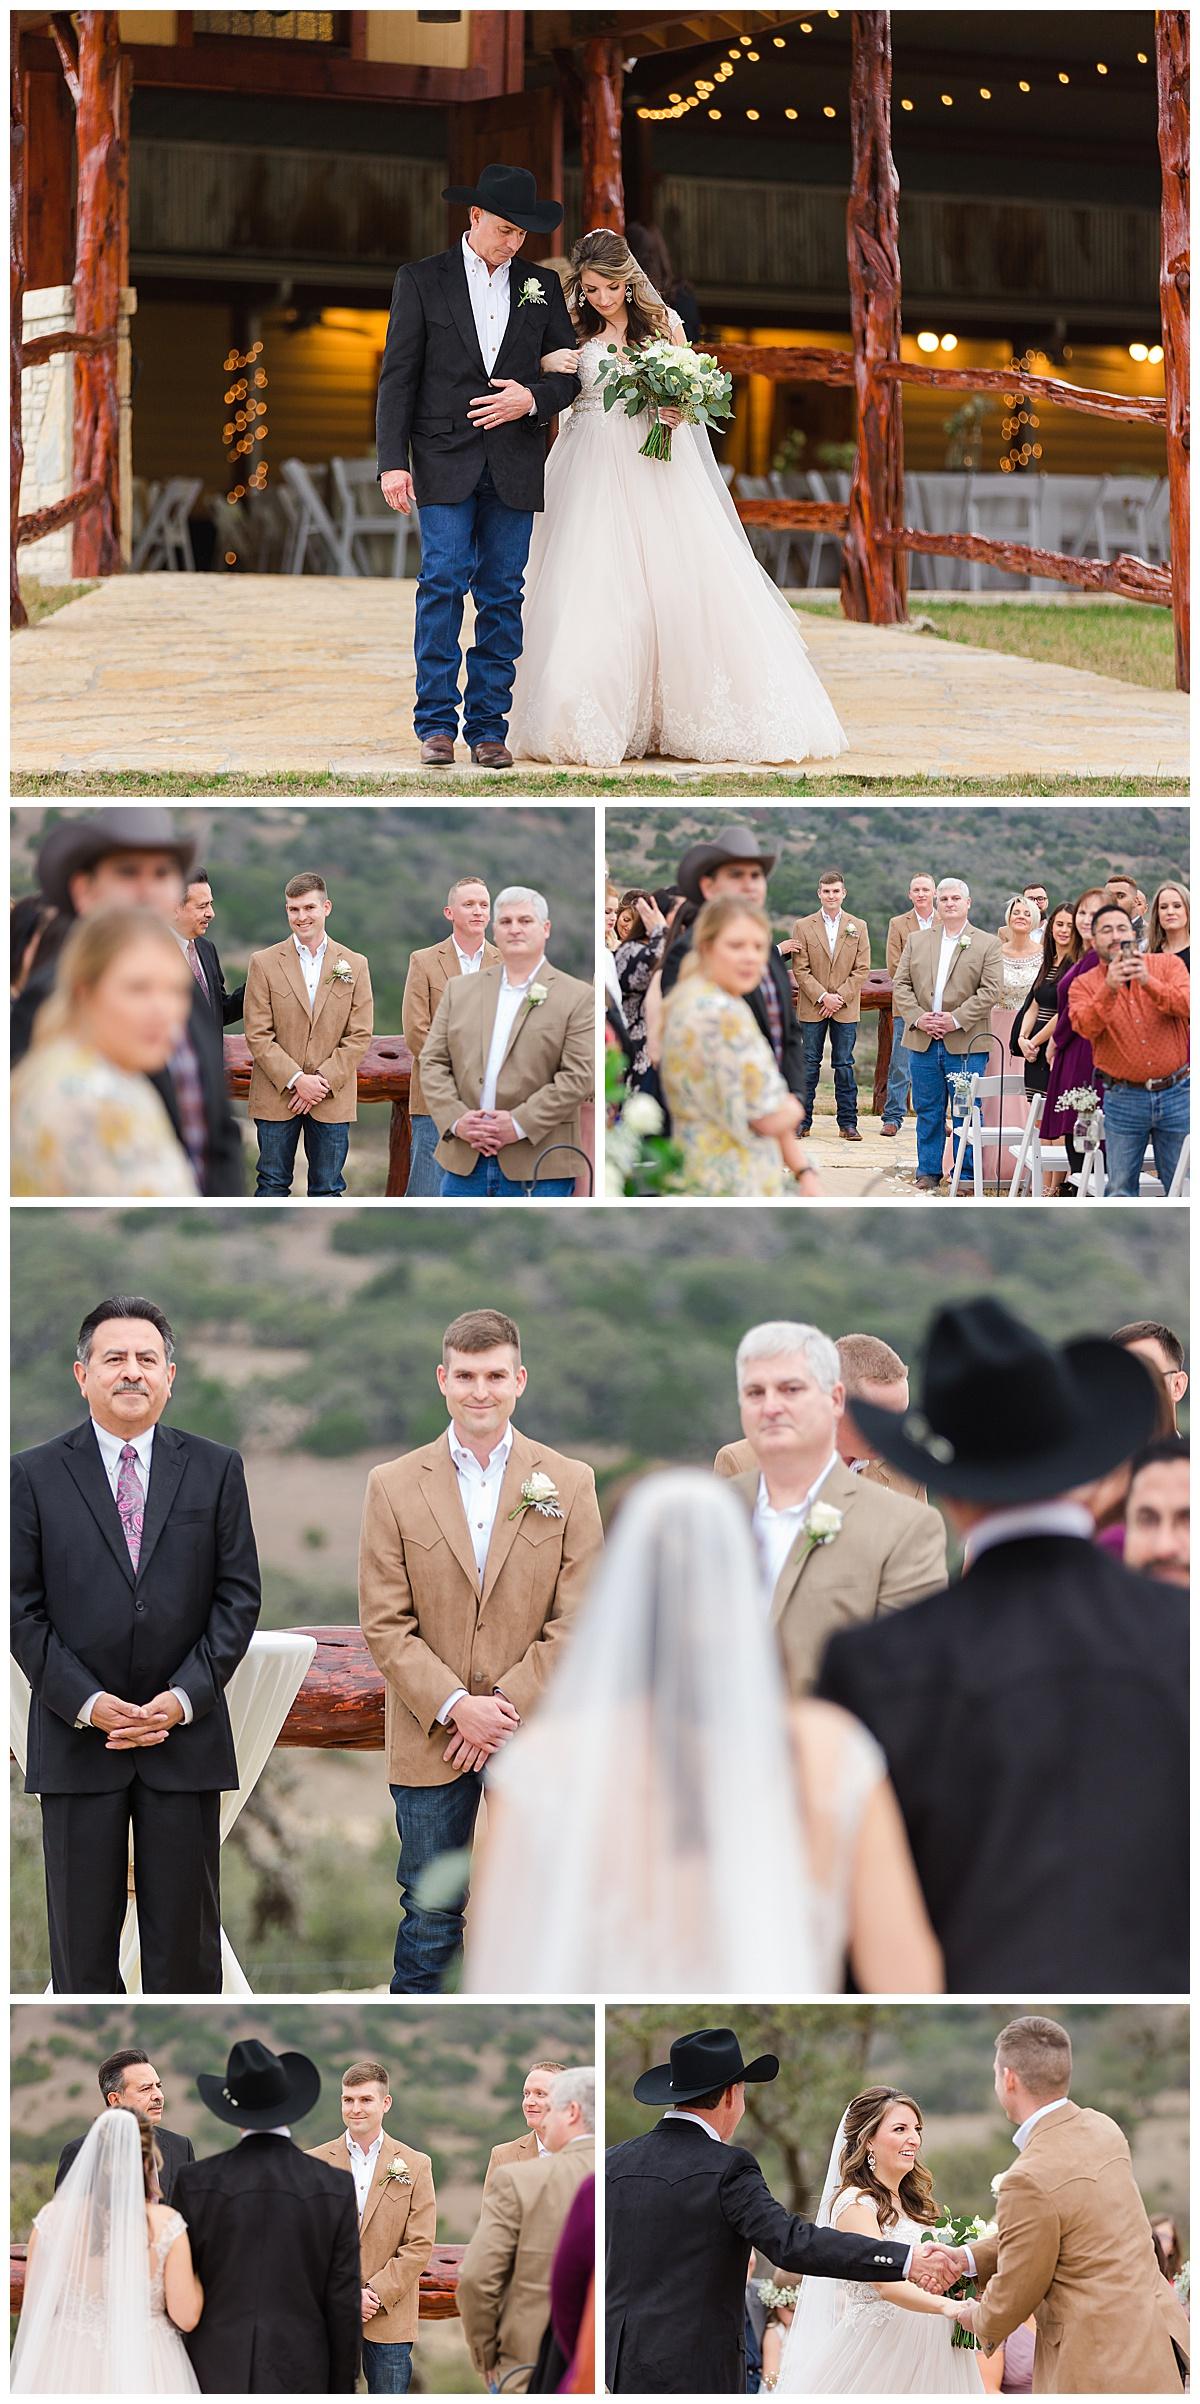 Wedding-Photographer-Texas-Hill-Country-Happy-H-Ranch-Comfor-Texas-Carly-Barton-Photography_0021.jpg